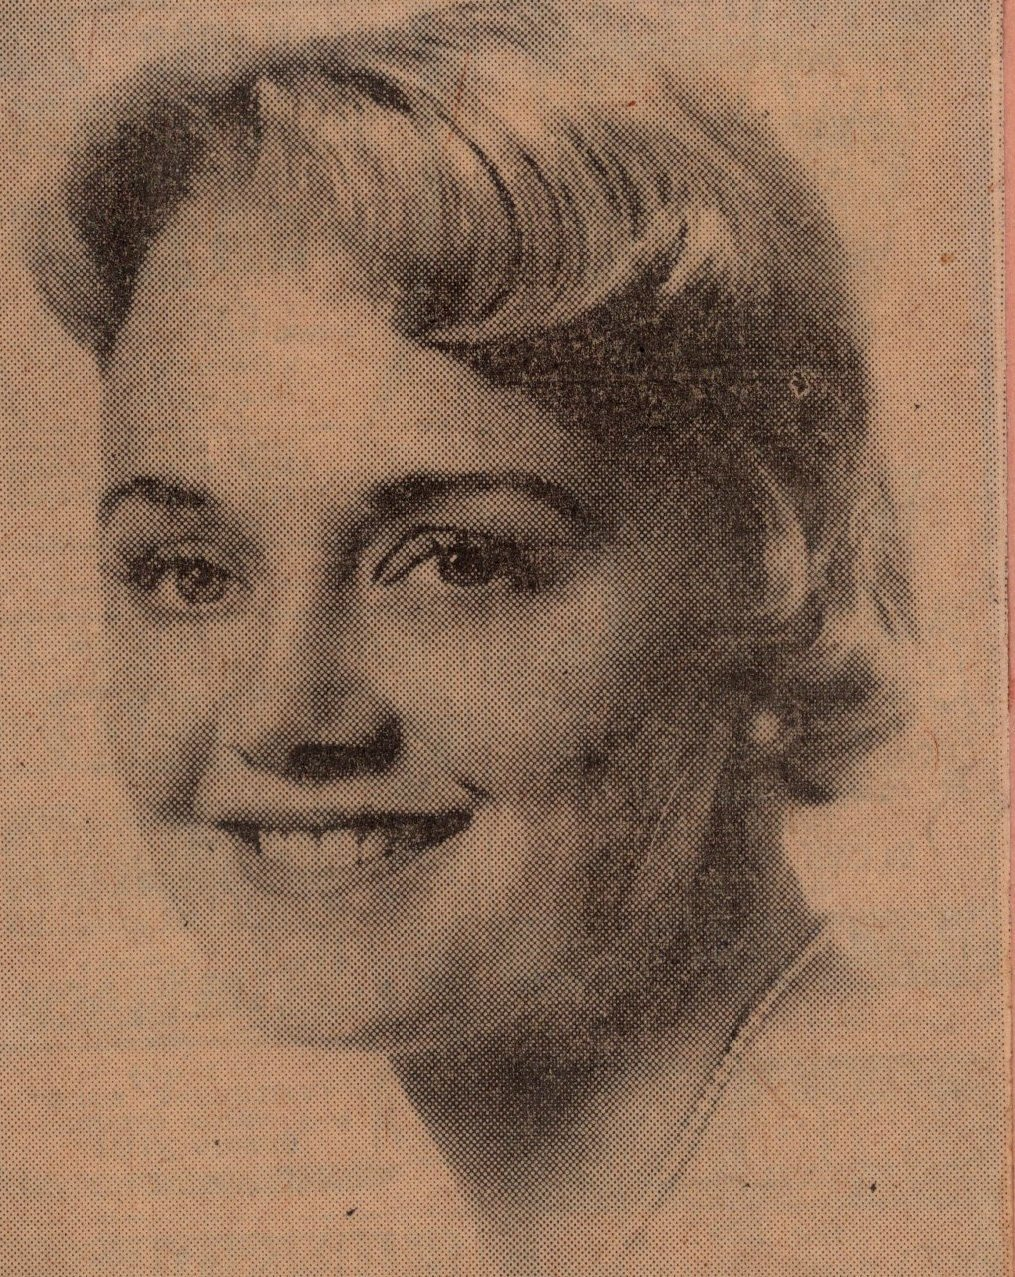 Edwina C. Gillis